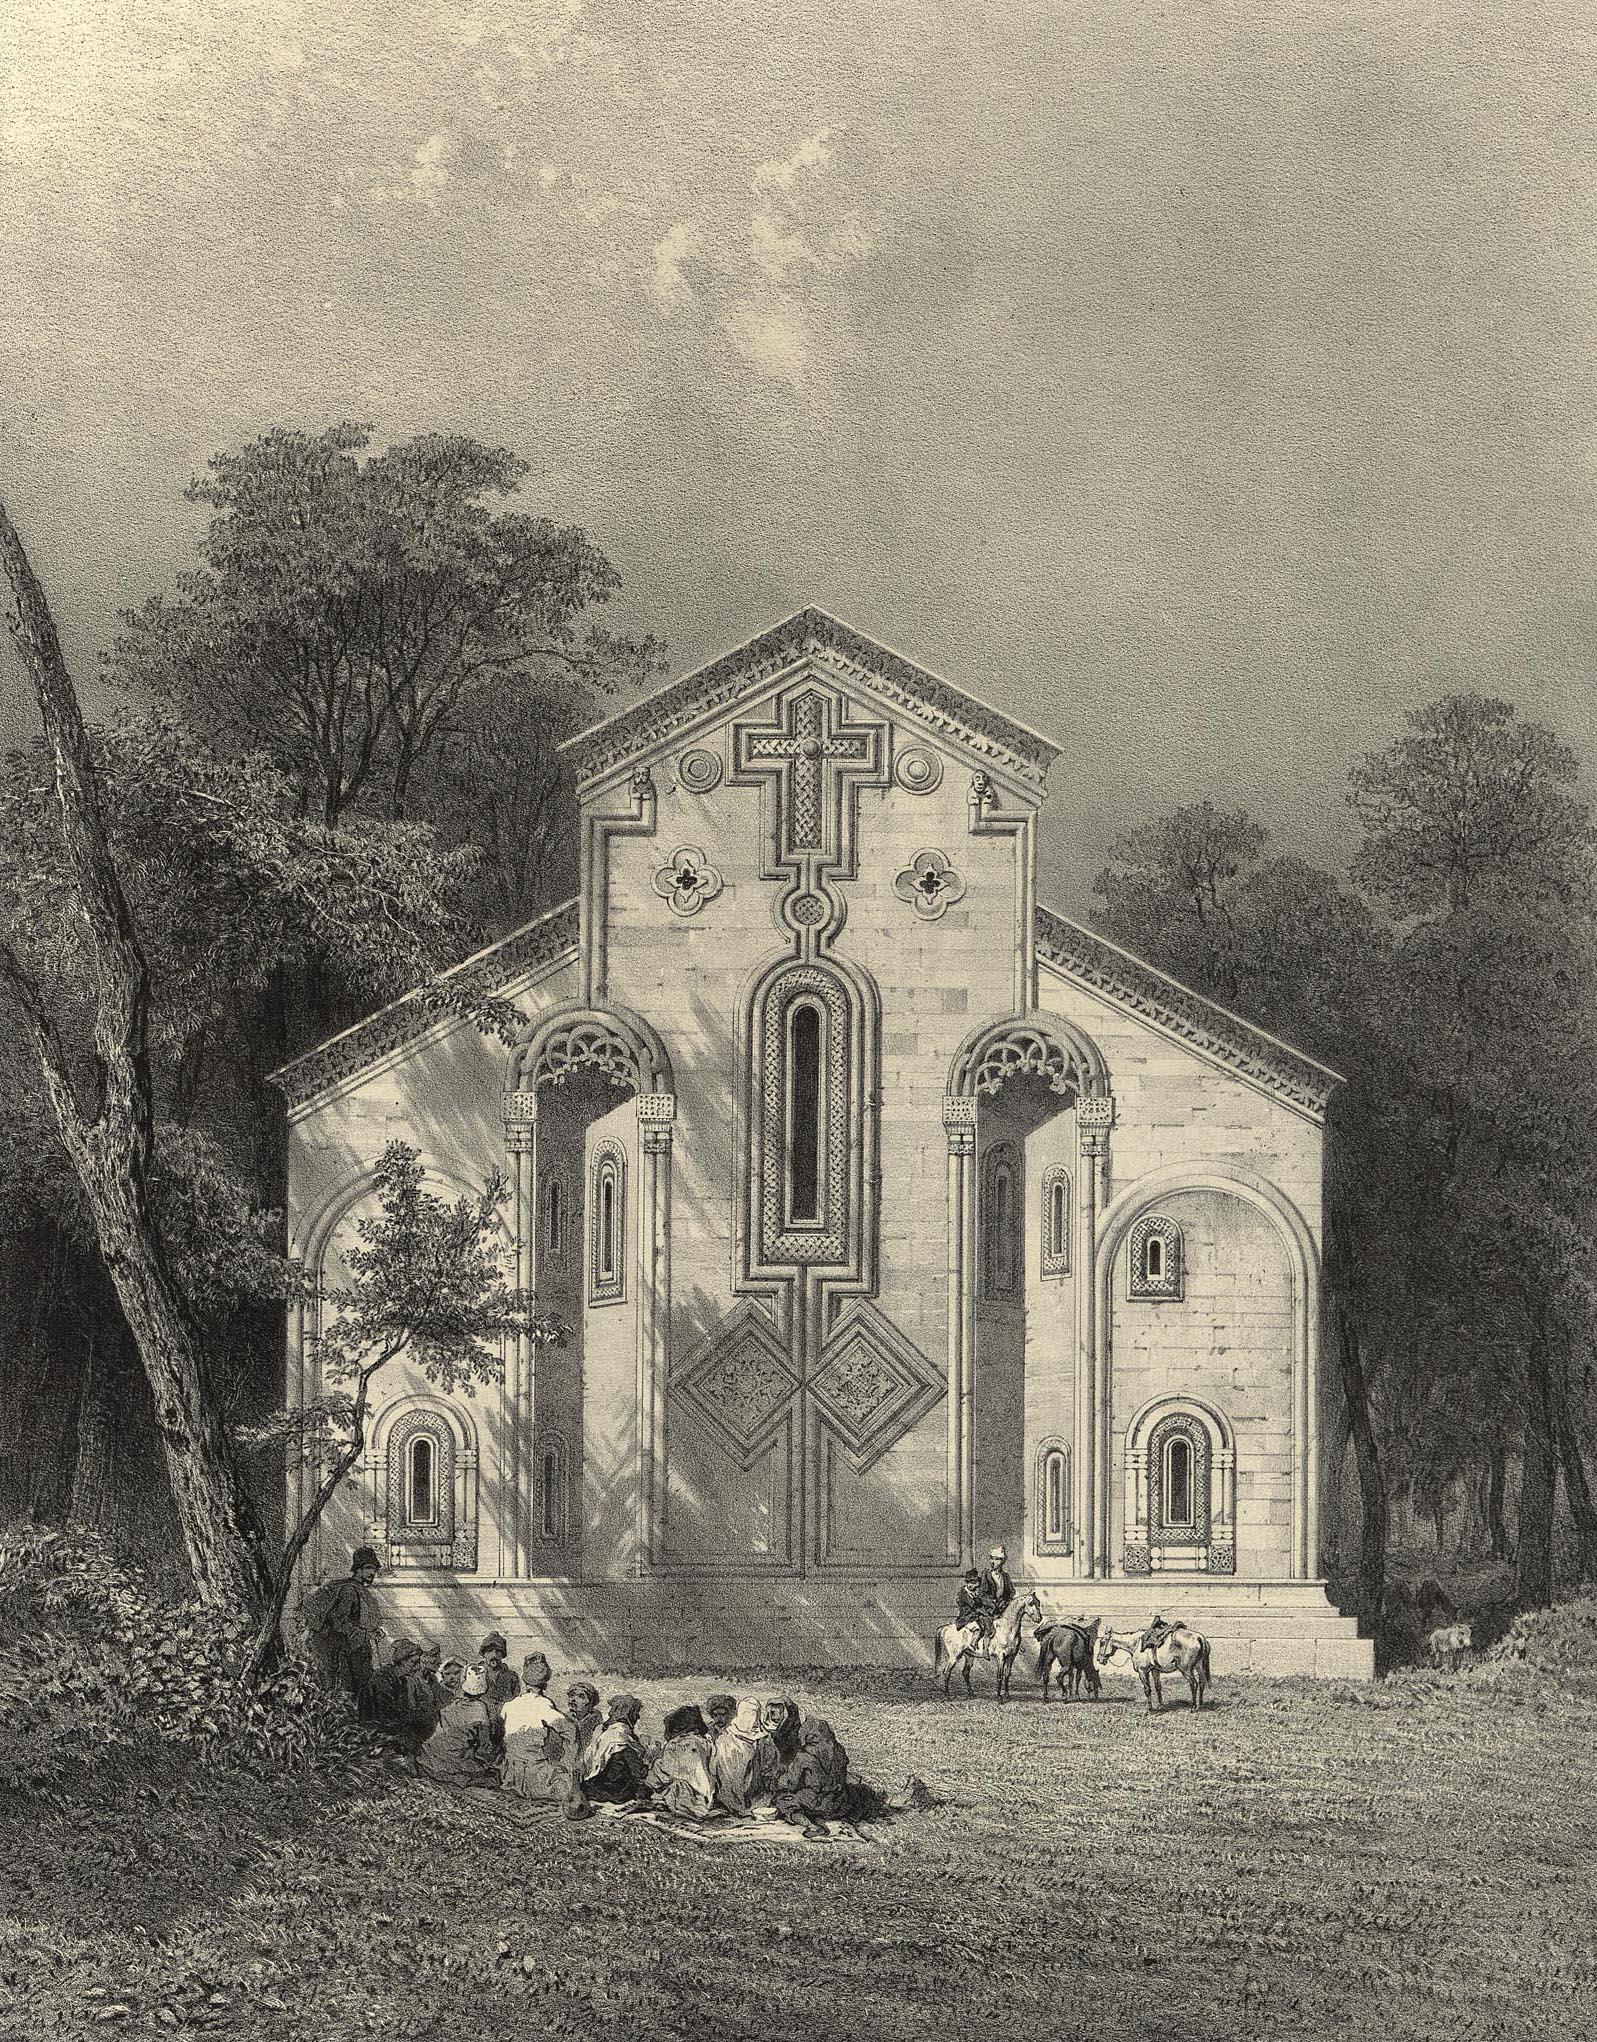 22. Georgie. Eglise du monastere de Caben / Грузия. Церковь монастыря Кабени.